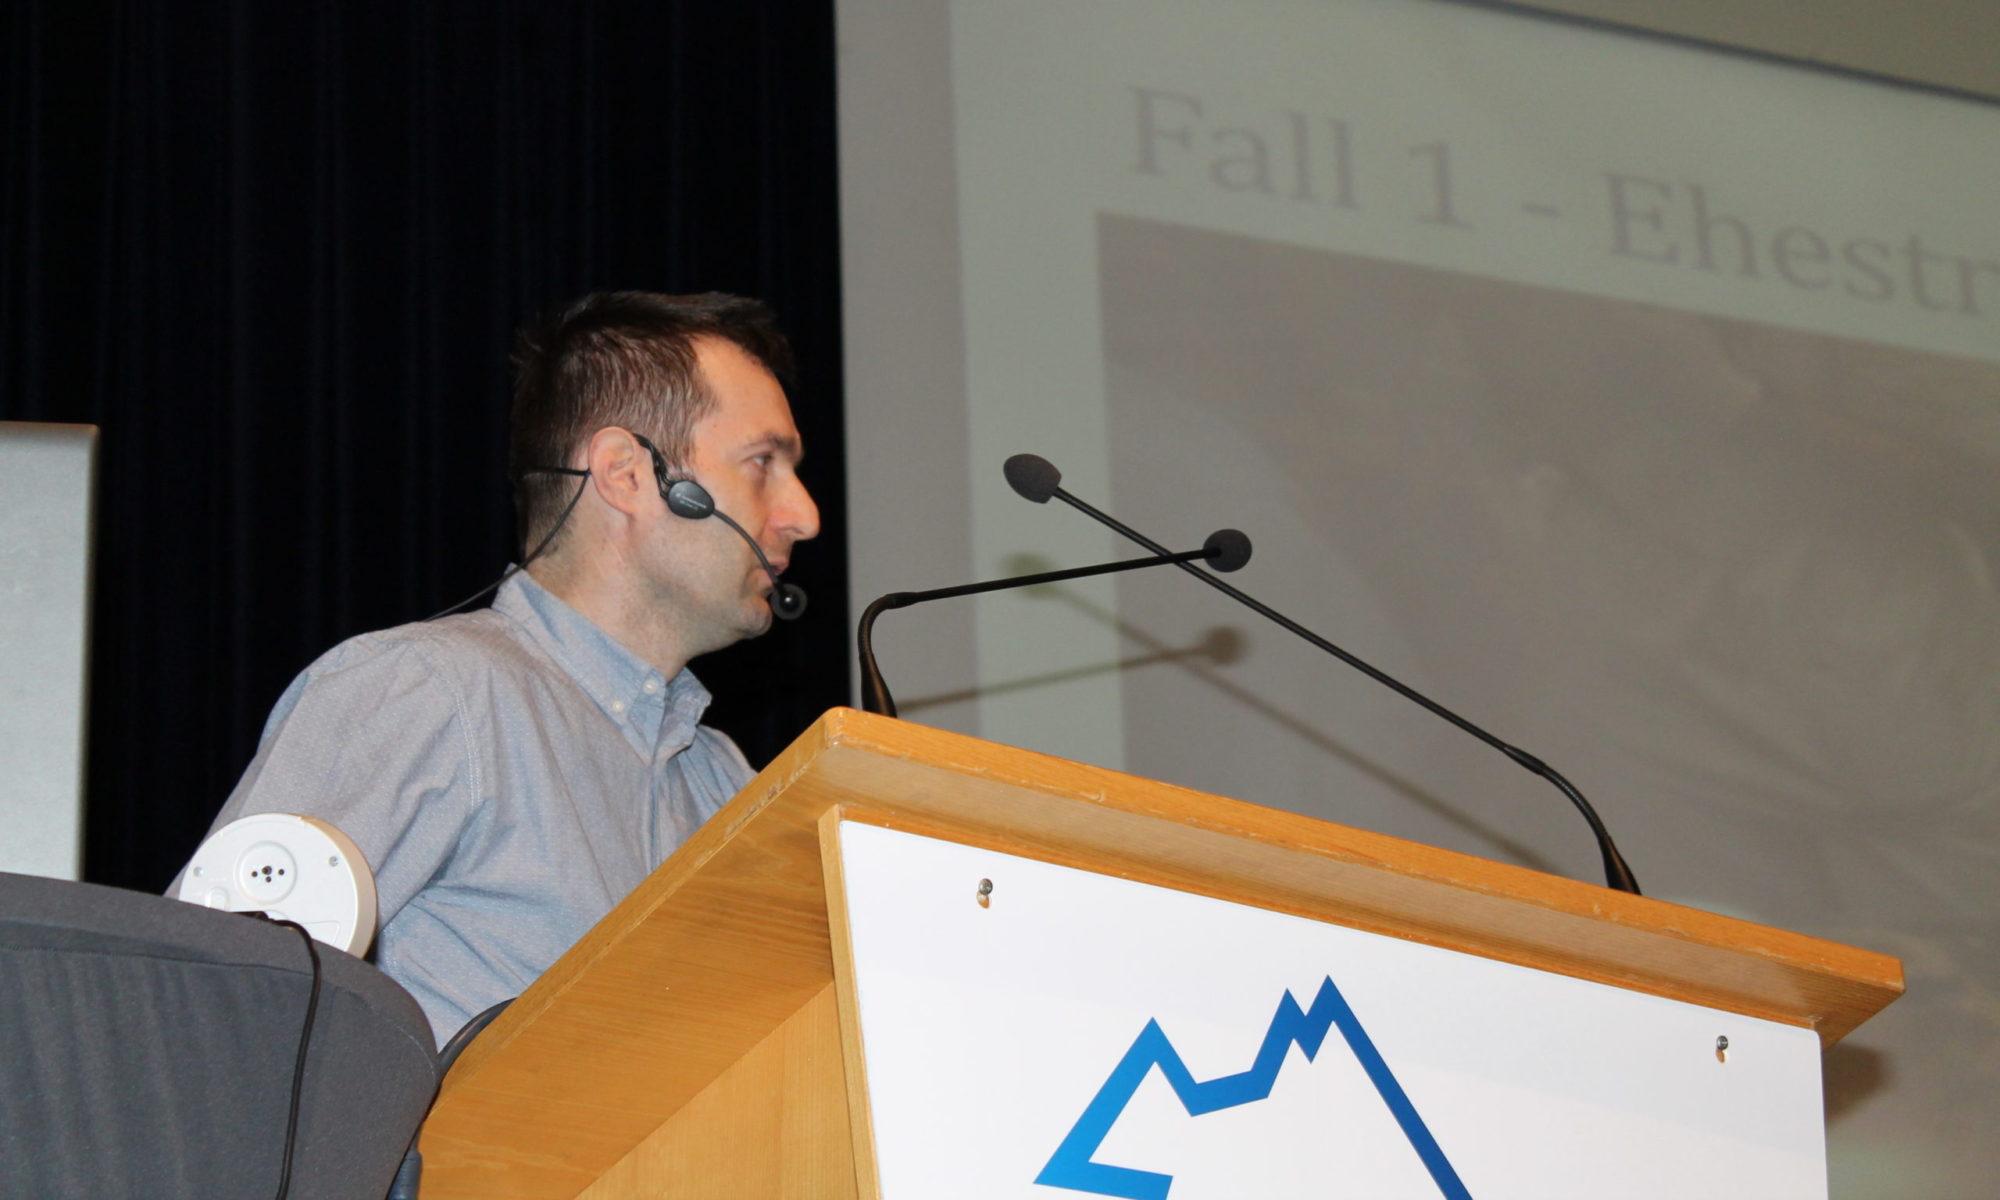 Ing. Dr. Alexander Franz MBA